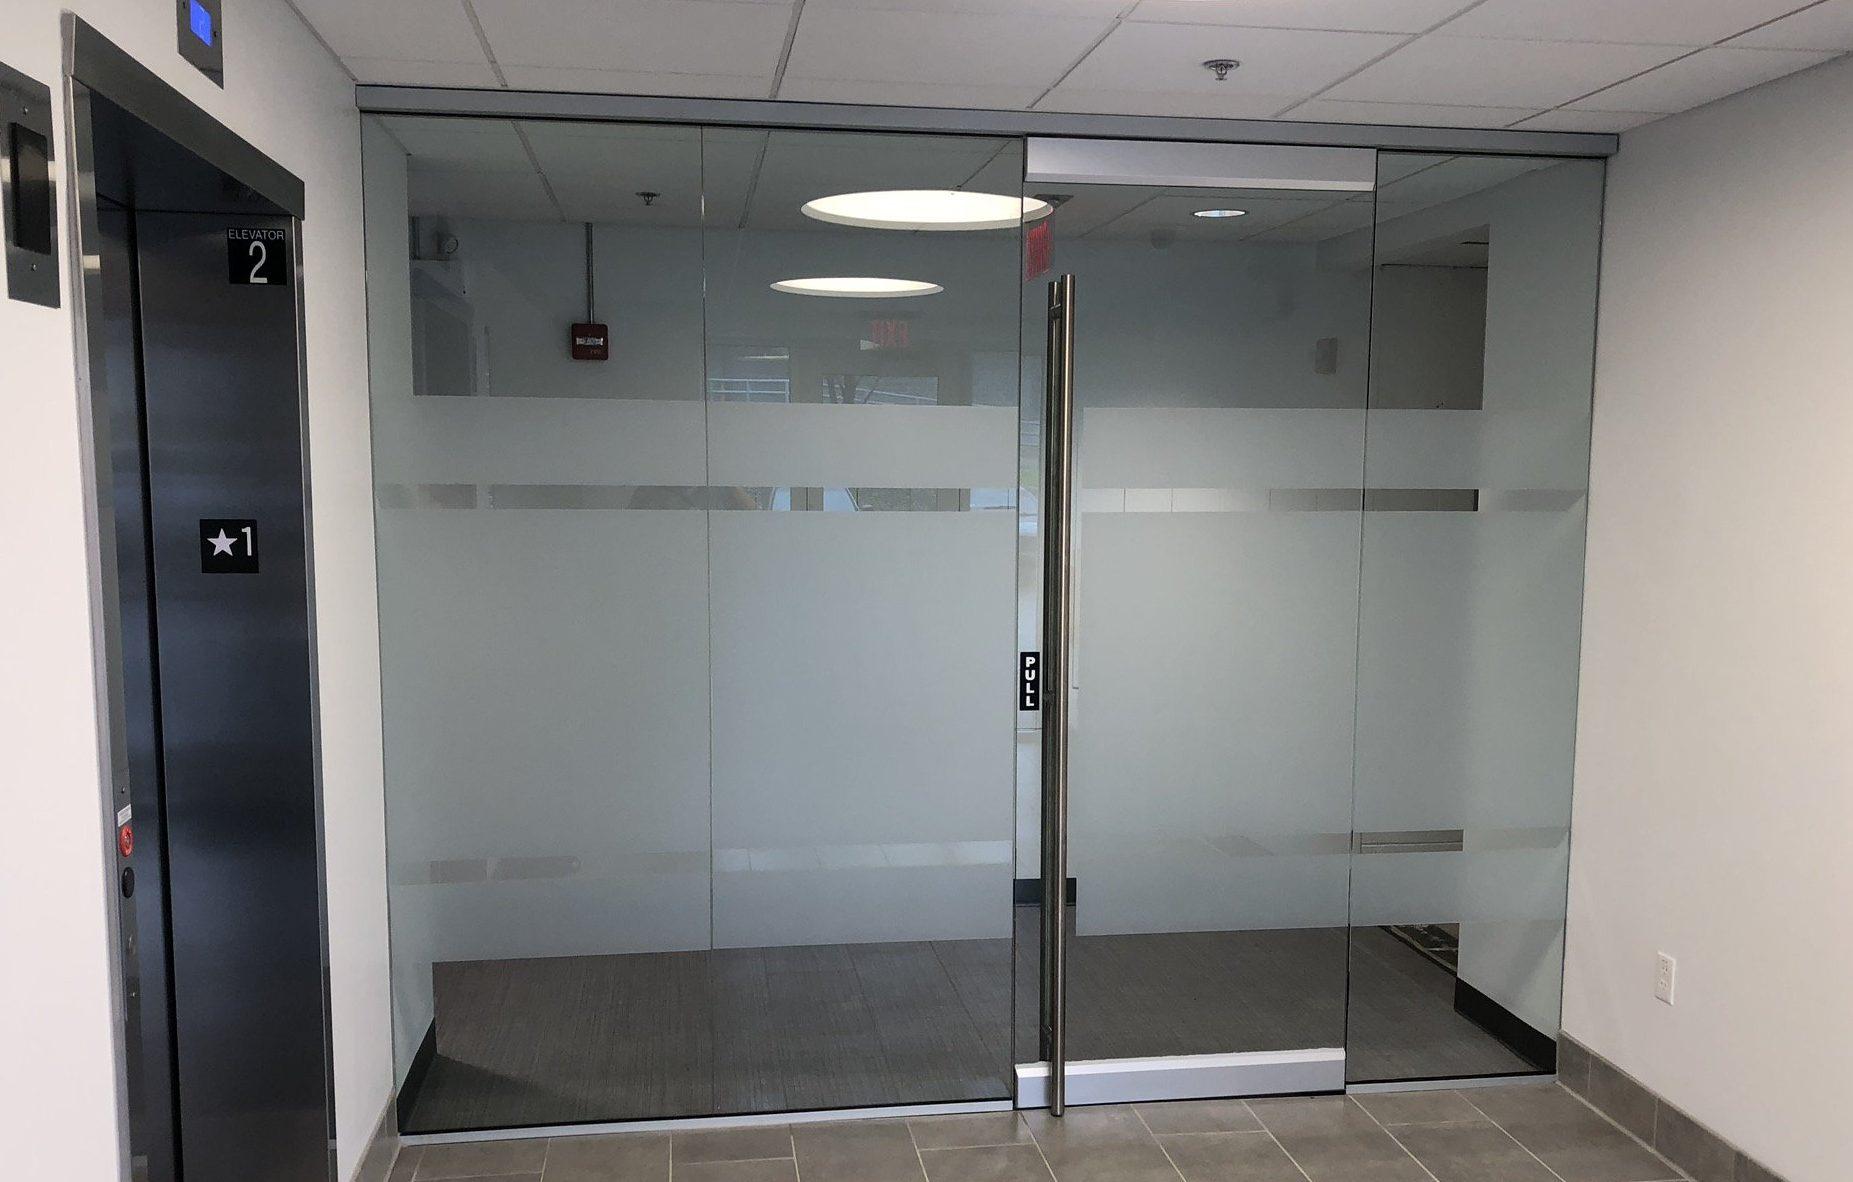 Transform Lehigh Valley Area Glass Panels by Retrofitting Decorative Window Films - Decorative Glass Film in the Lehigh Valley Area of Pennsylvania